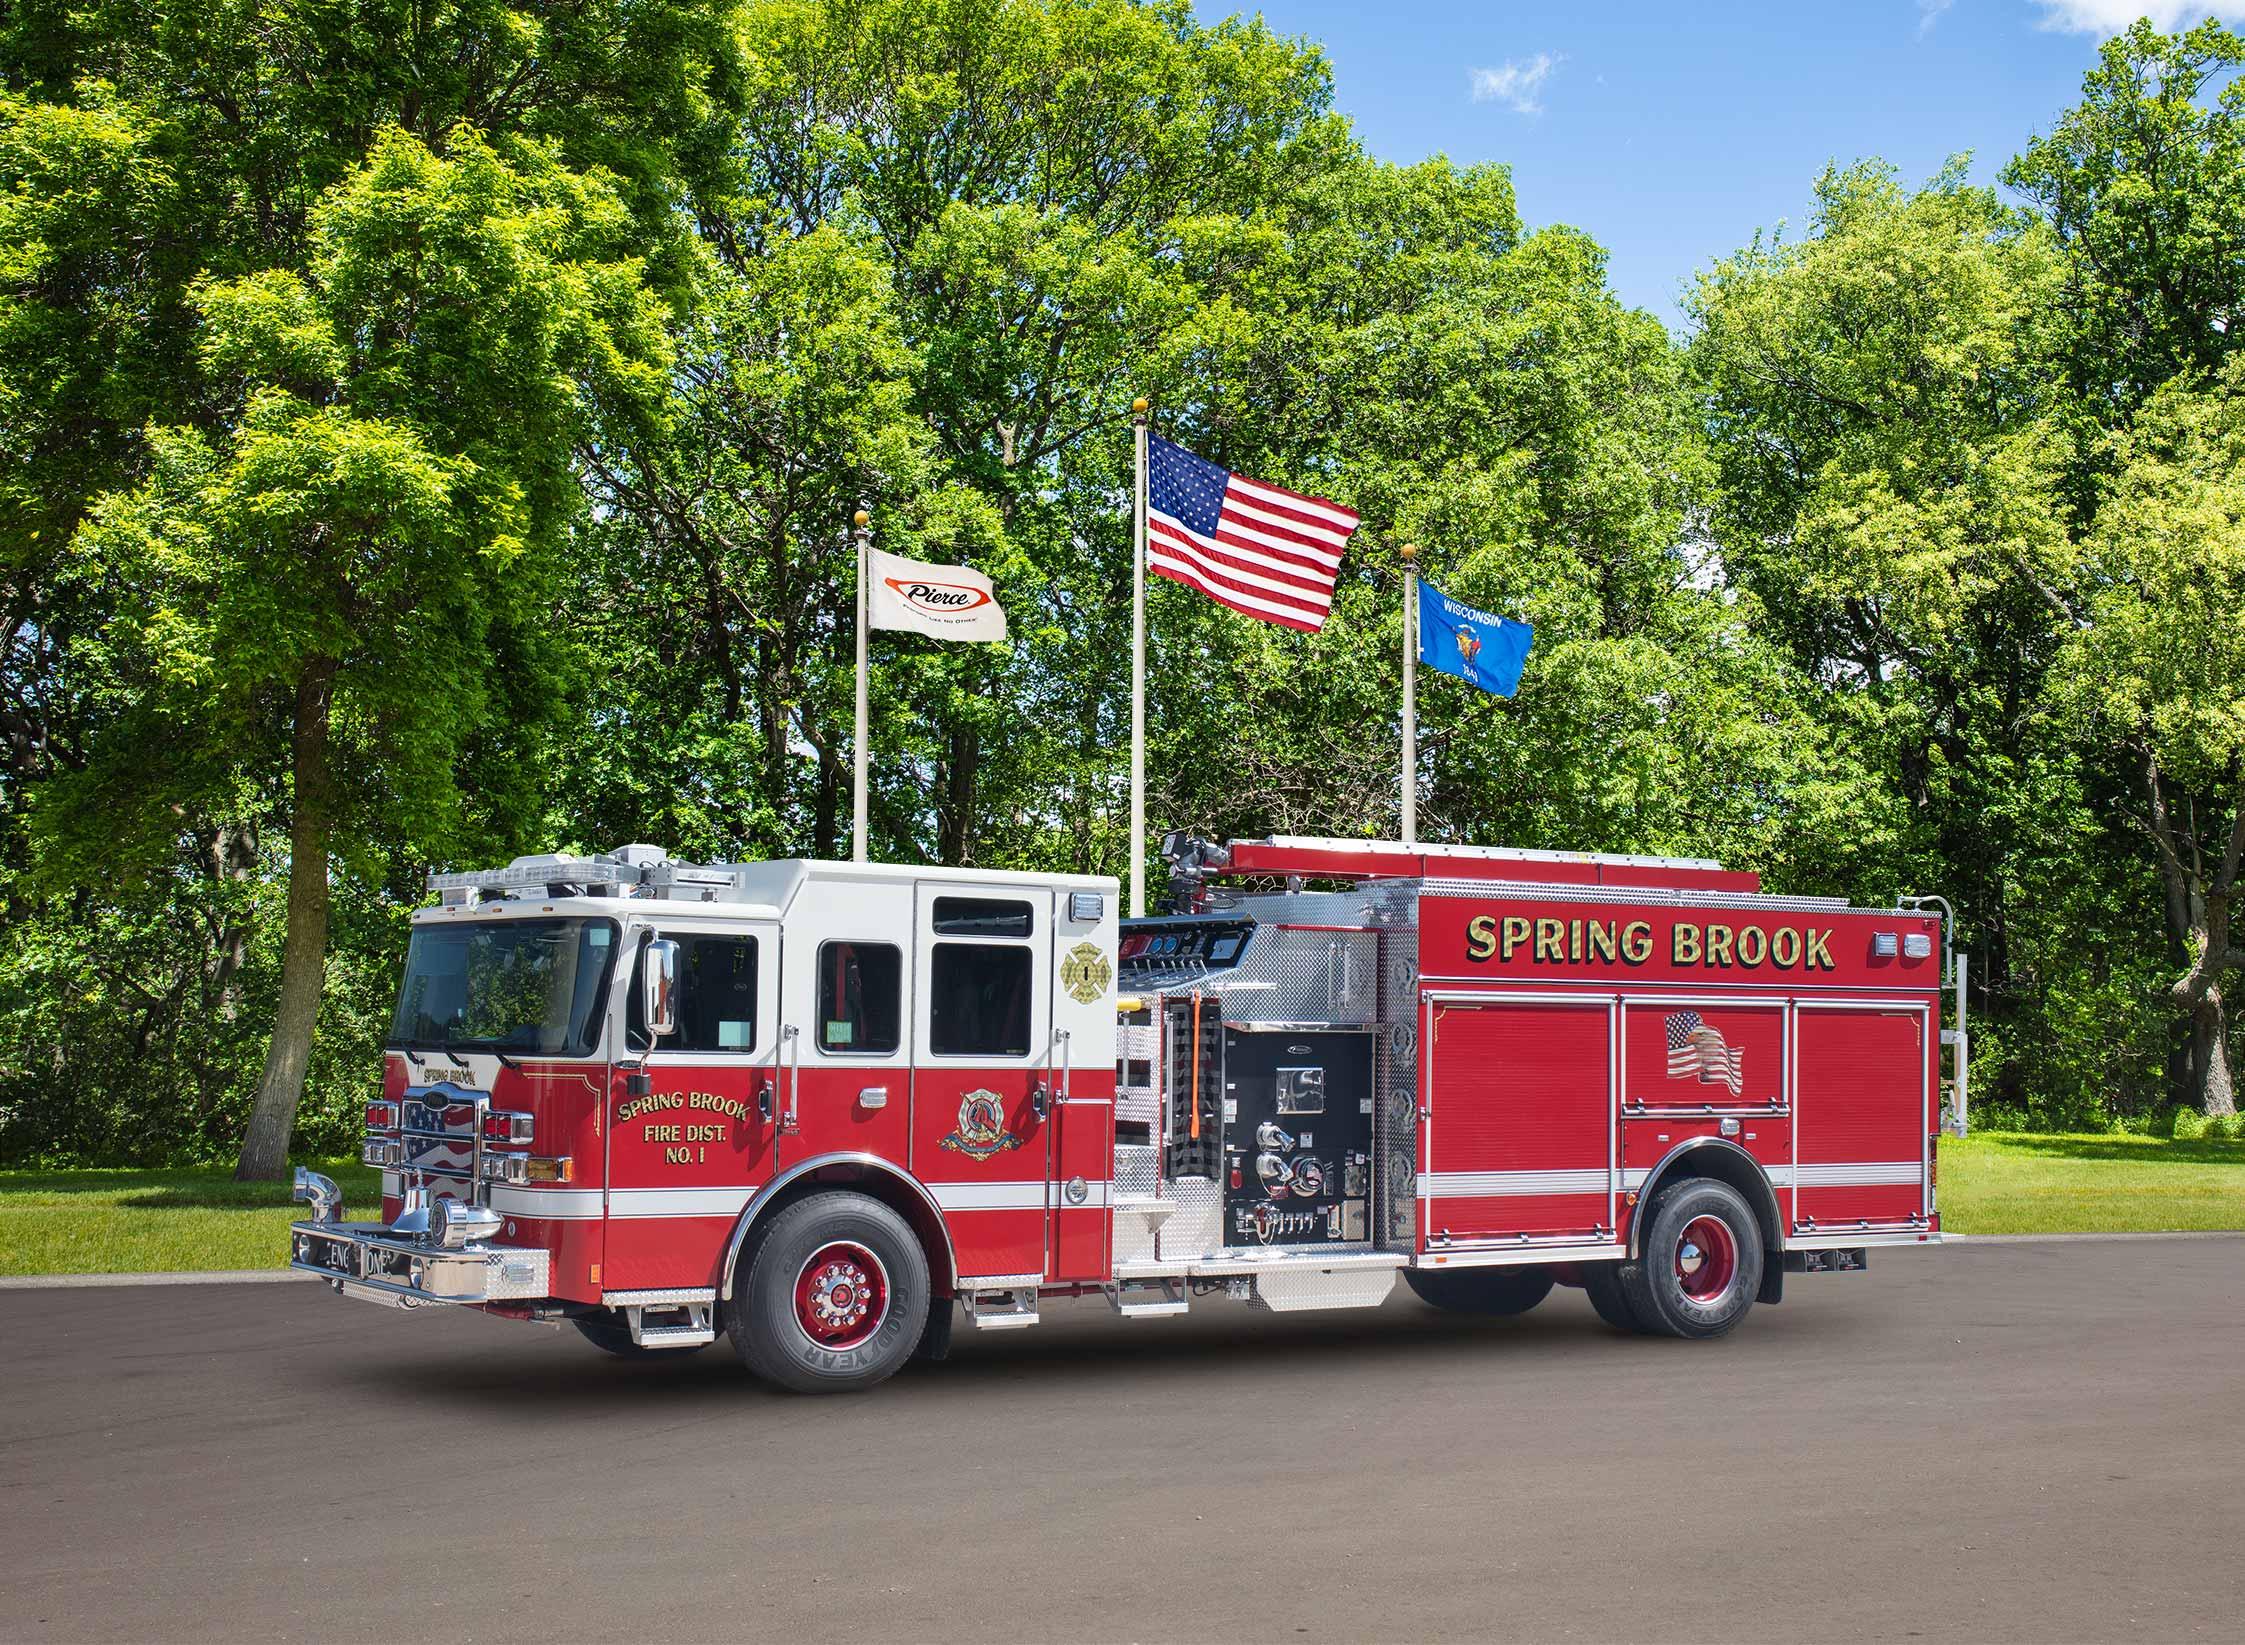 Spring Brook Fire District No.1 - Pumper